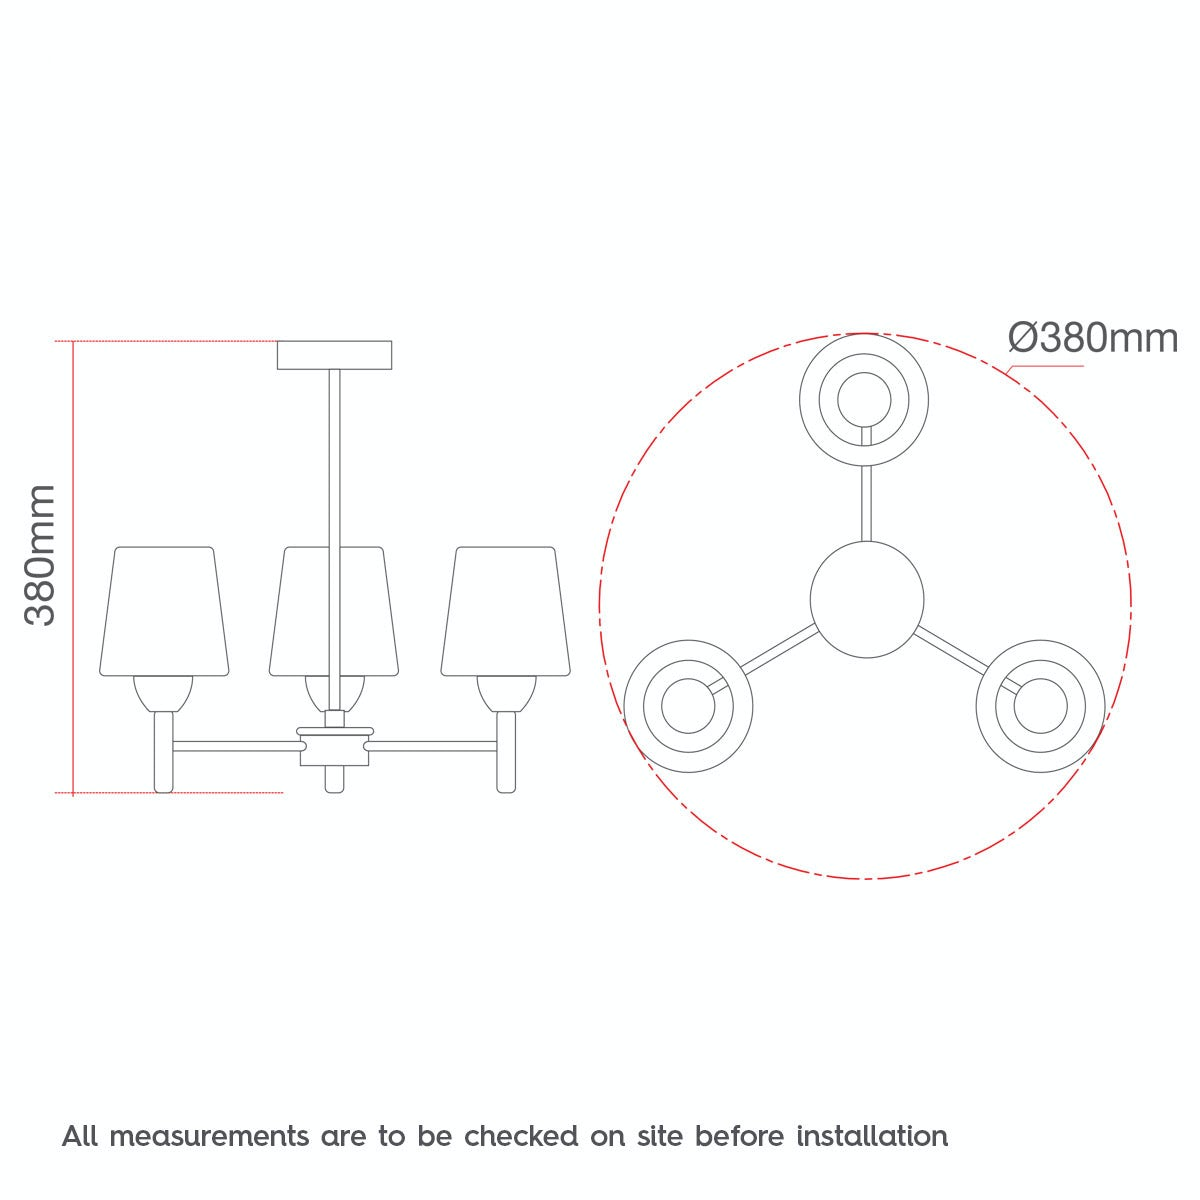 Dimensions for Forum Helios 3 light bathroom ceiling light